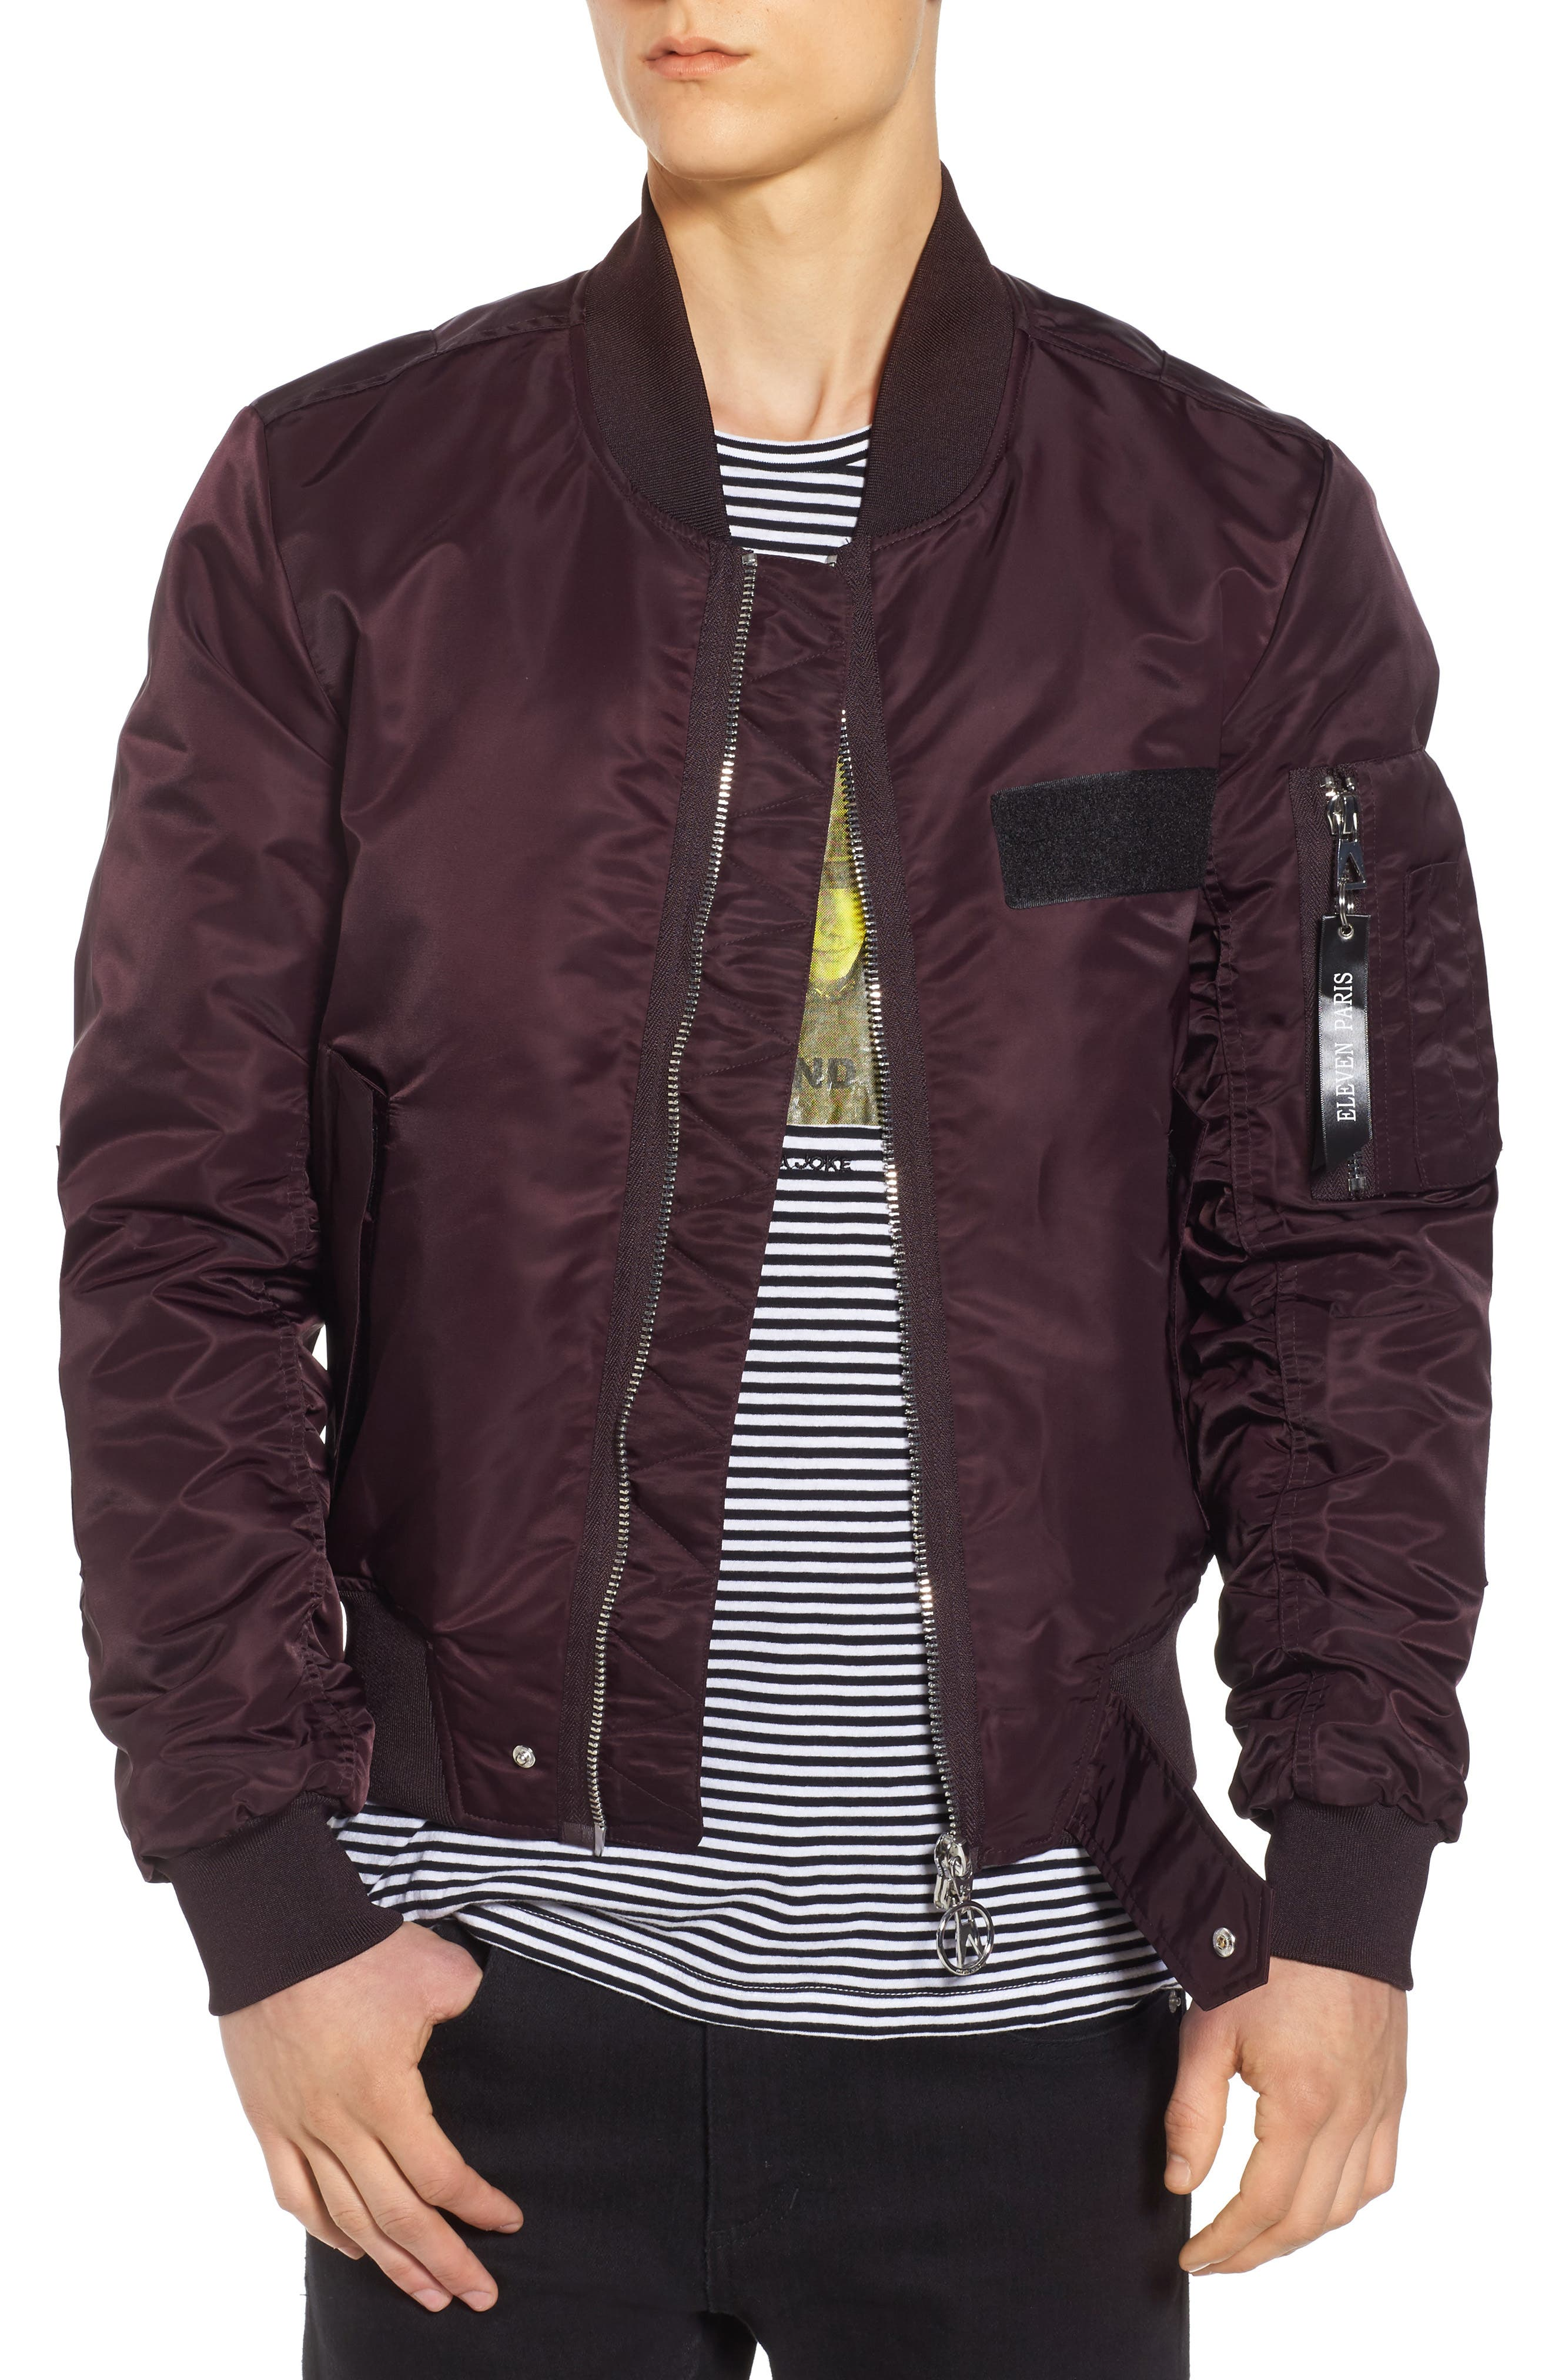 Nuxy Bomber Jacket,                         Main,                         color, Fudge